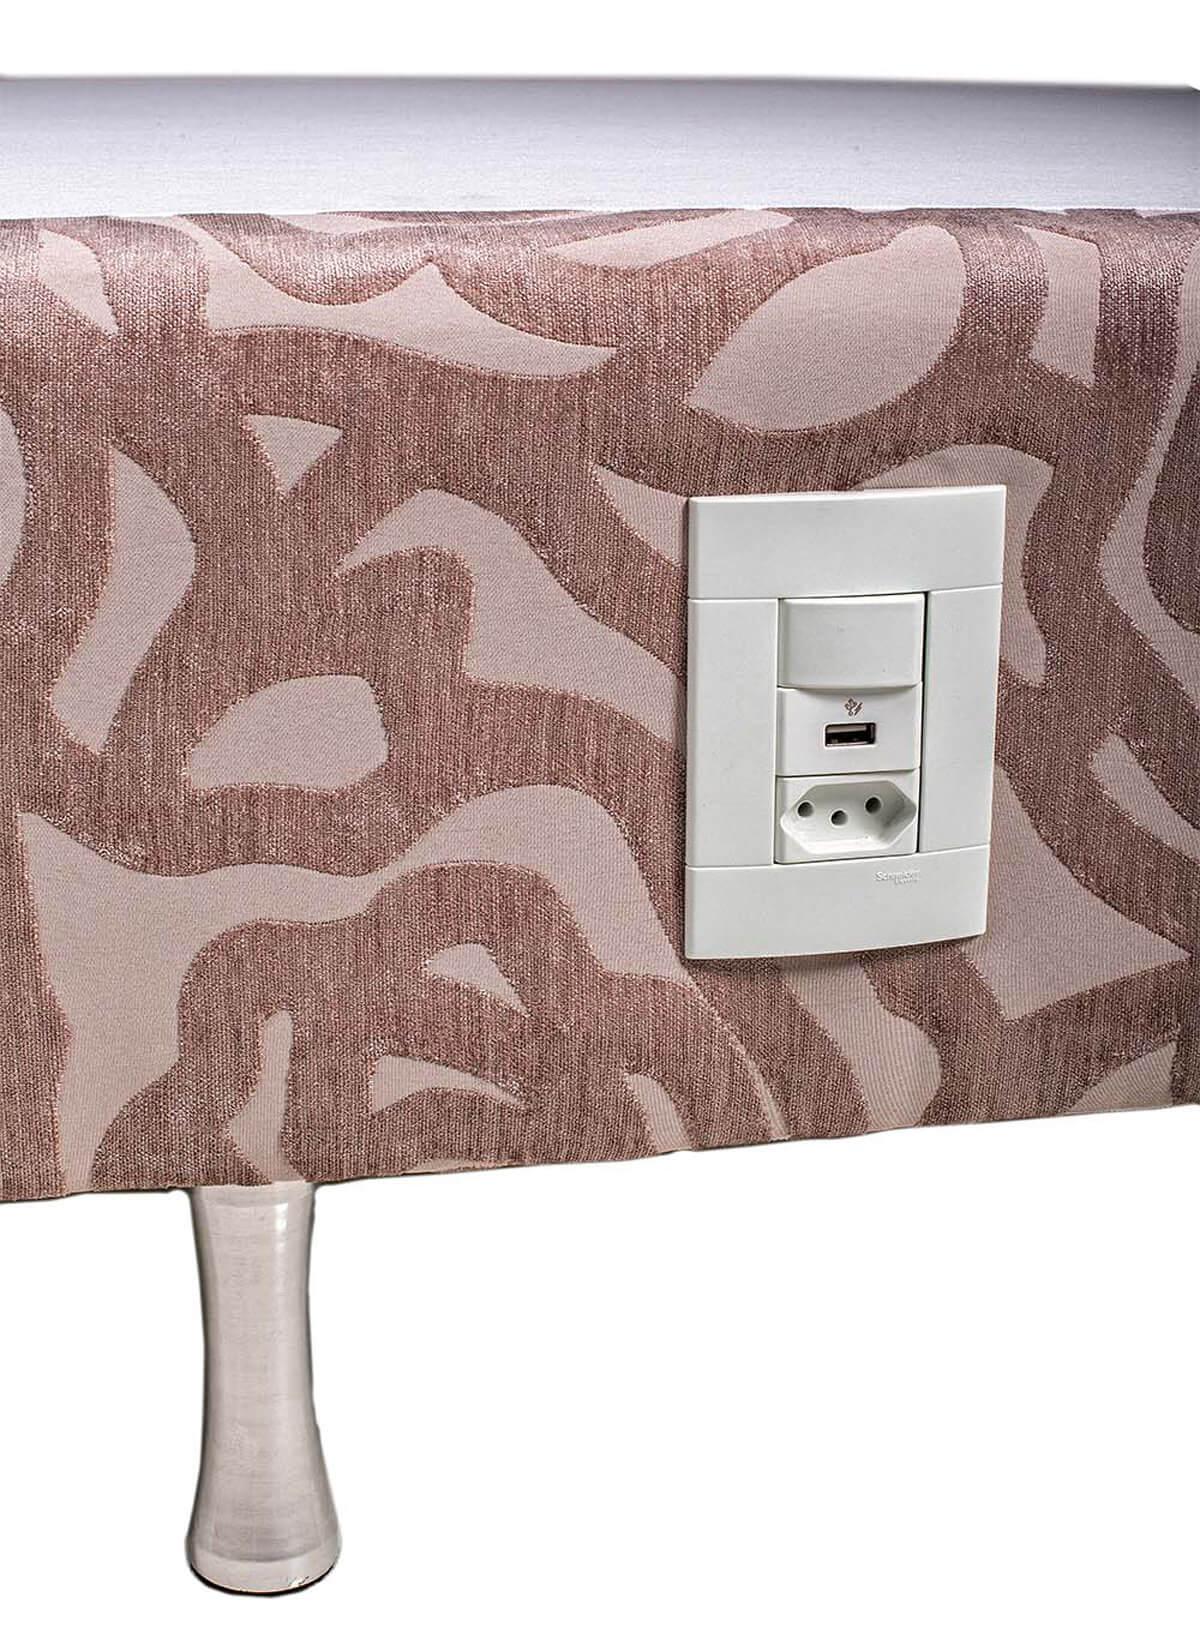 Box Iluminado  Solteiro 0,88x1,88 Usb C/kit Conect Suede Kenko Premium   - Kenko Premium Colchões